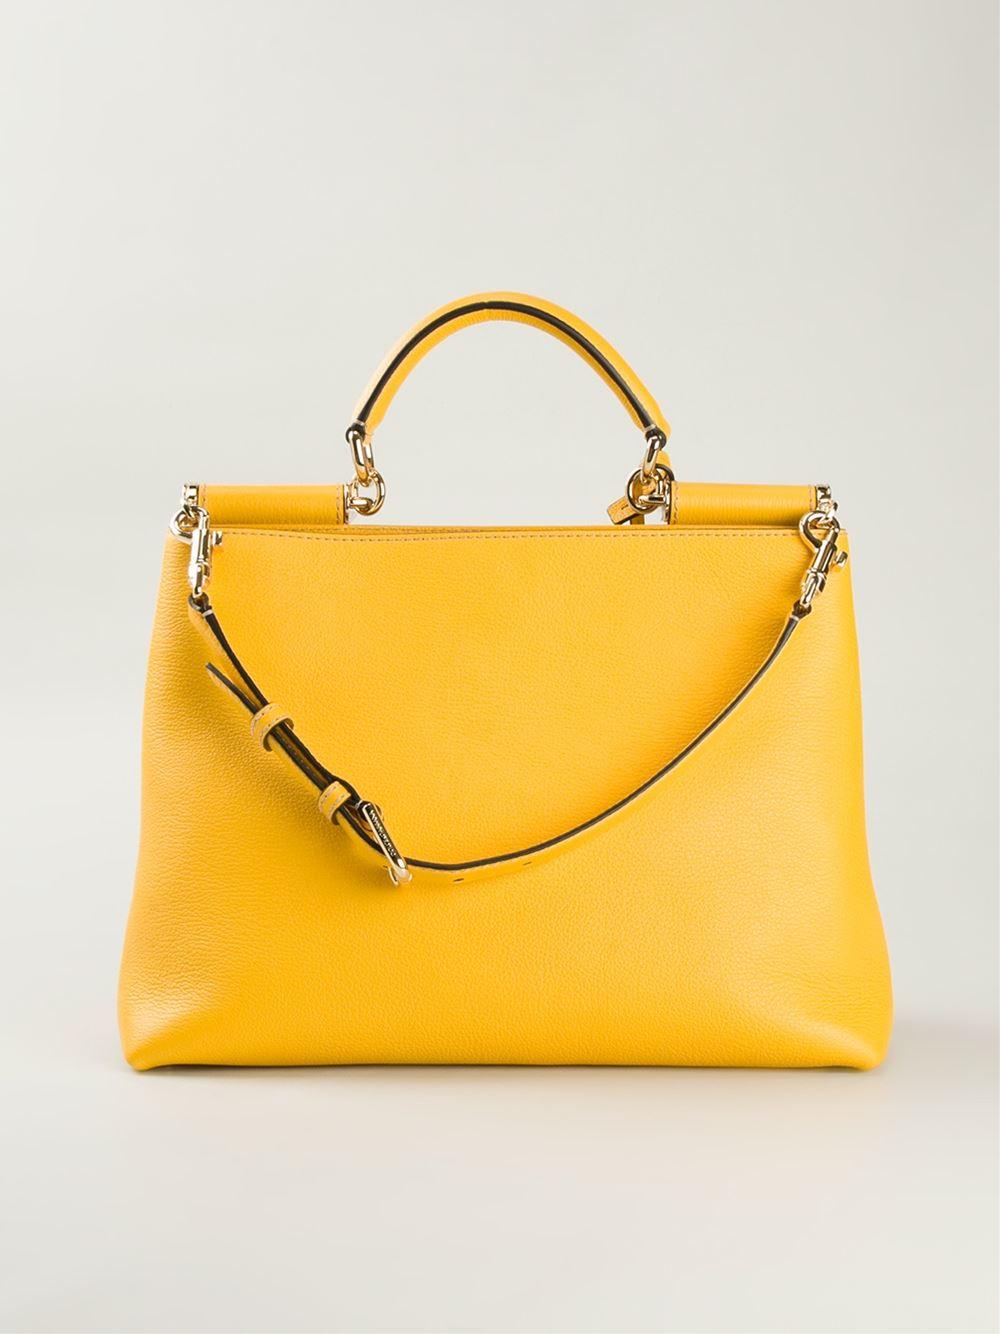 Dolce   Gabbana  Sicily  Shopping Tote in Yellow - Lyst 1da03d581fc5f